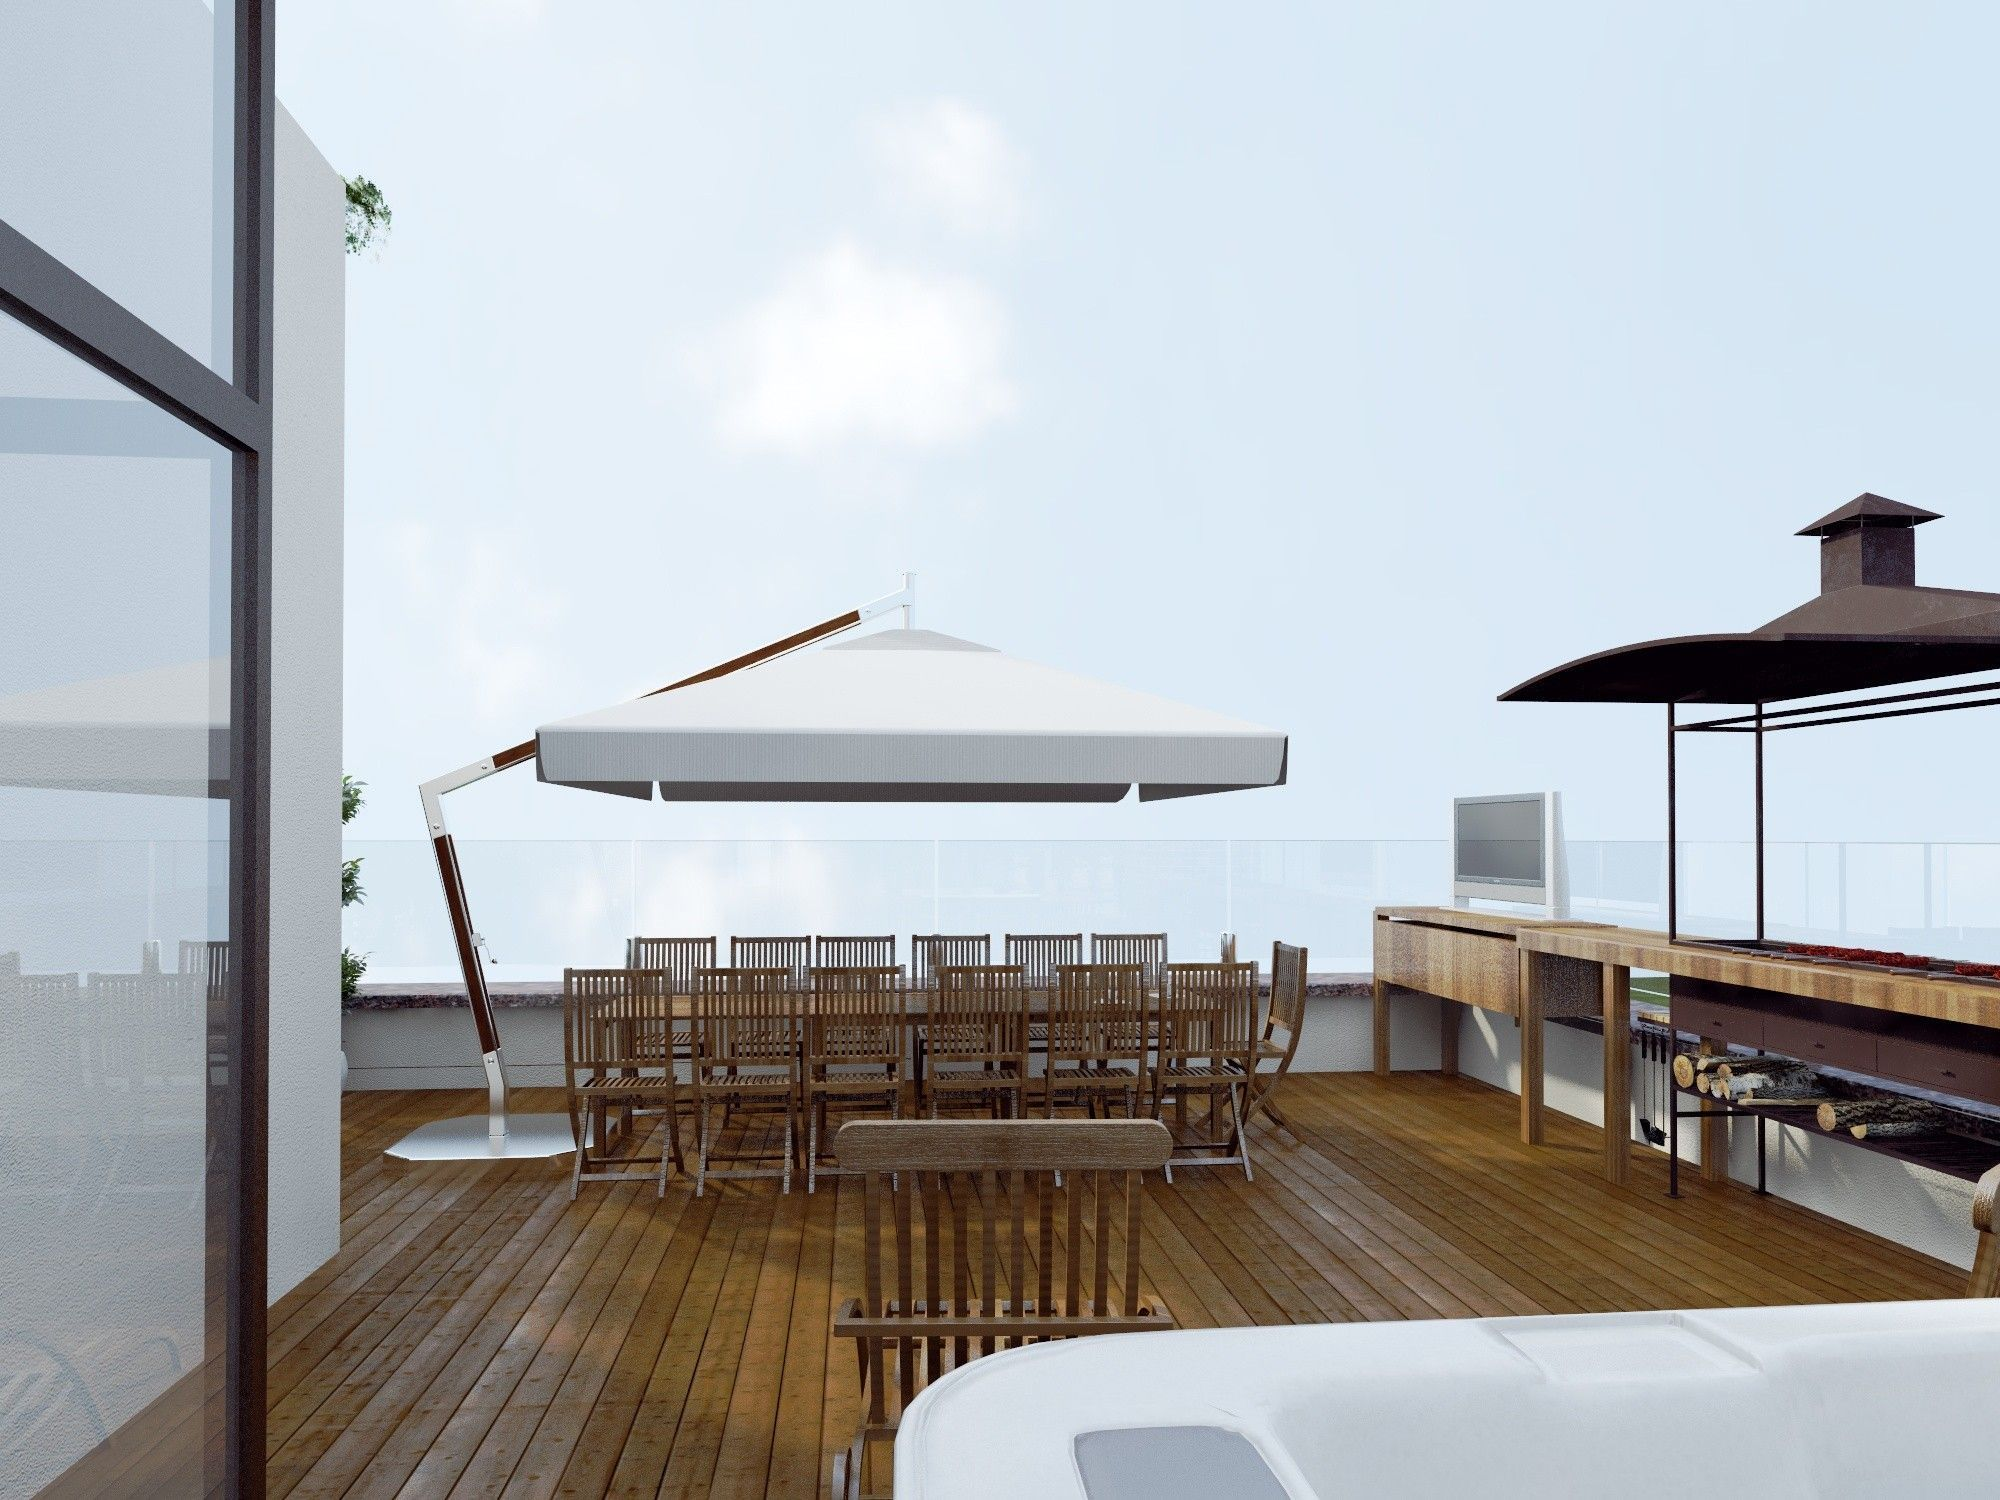 Дизайн проект террасы на крыше